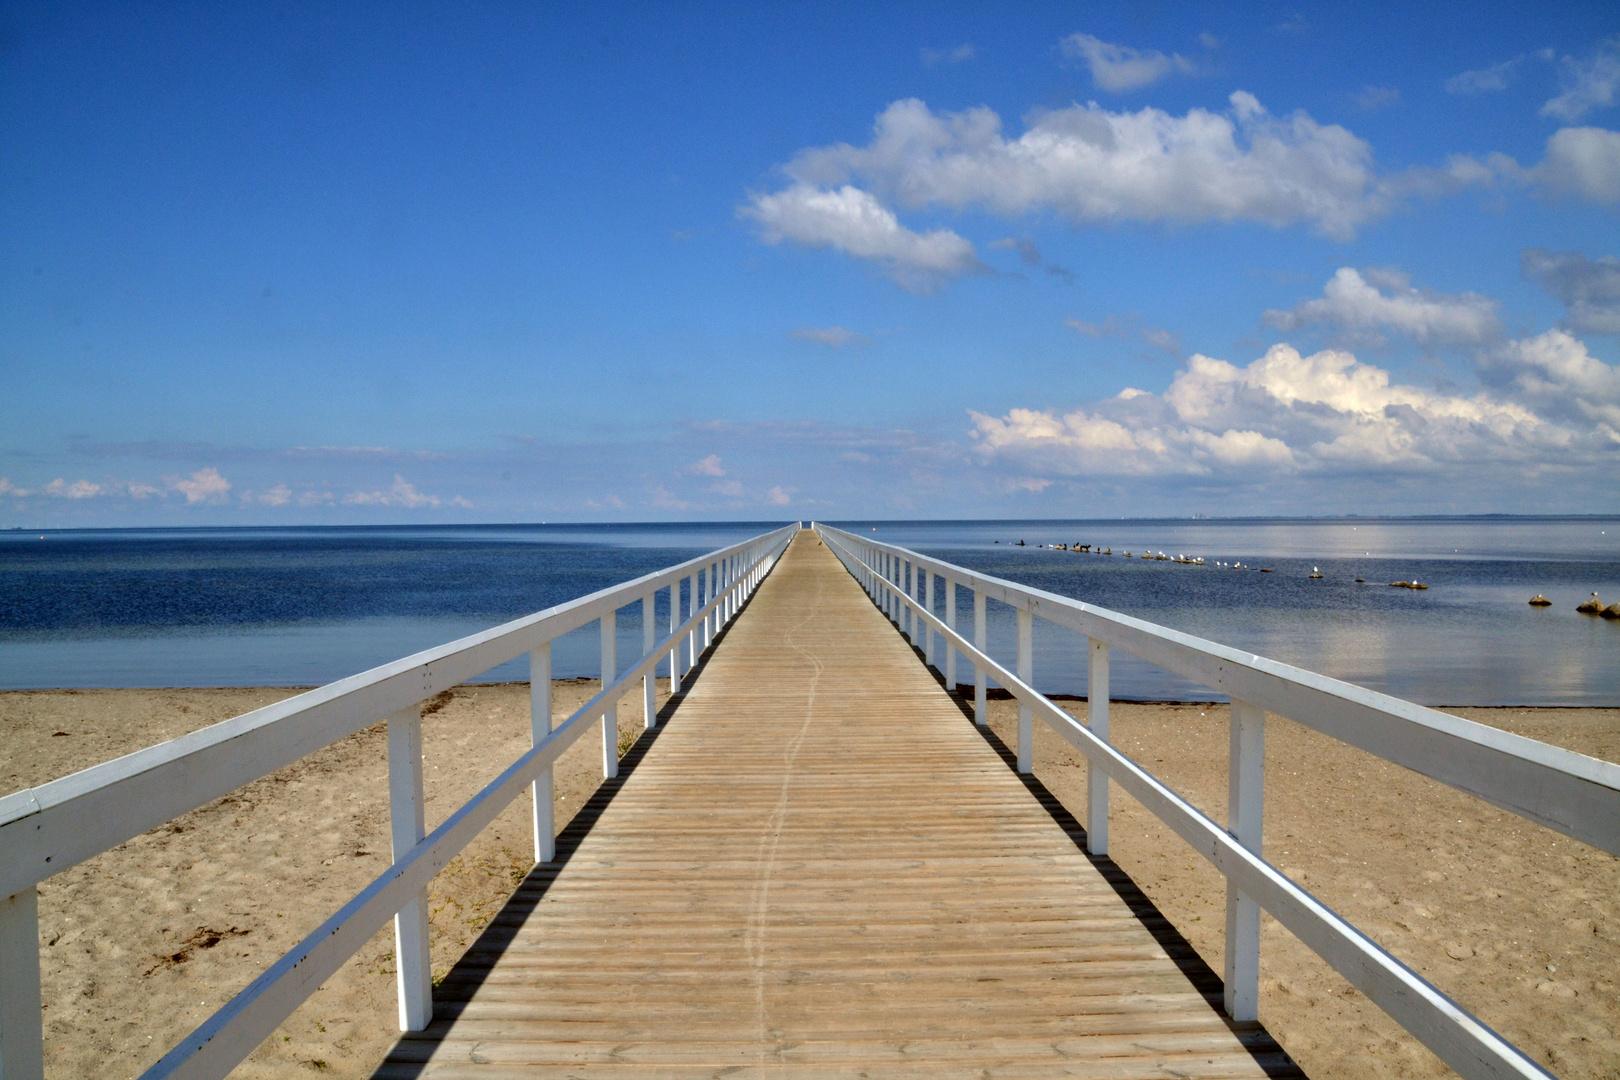 Am Strand von Malmö